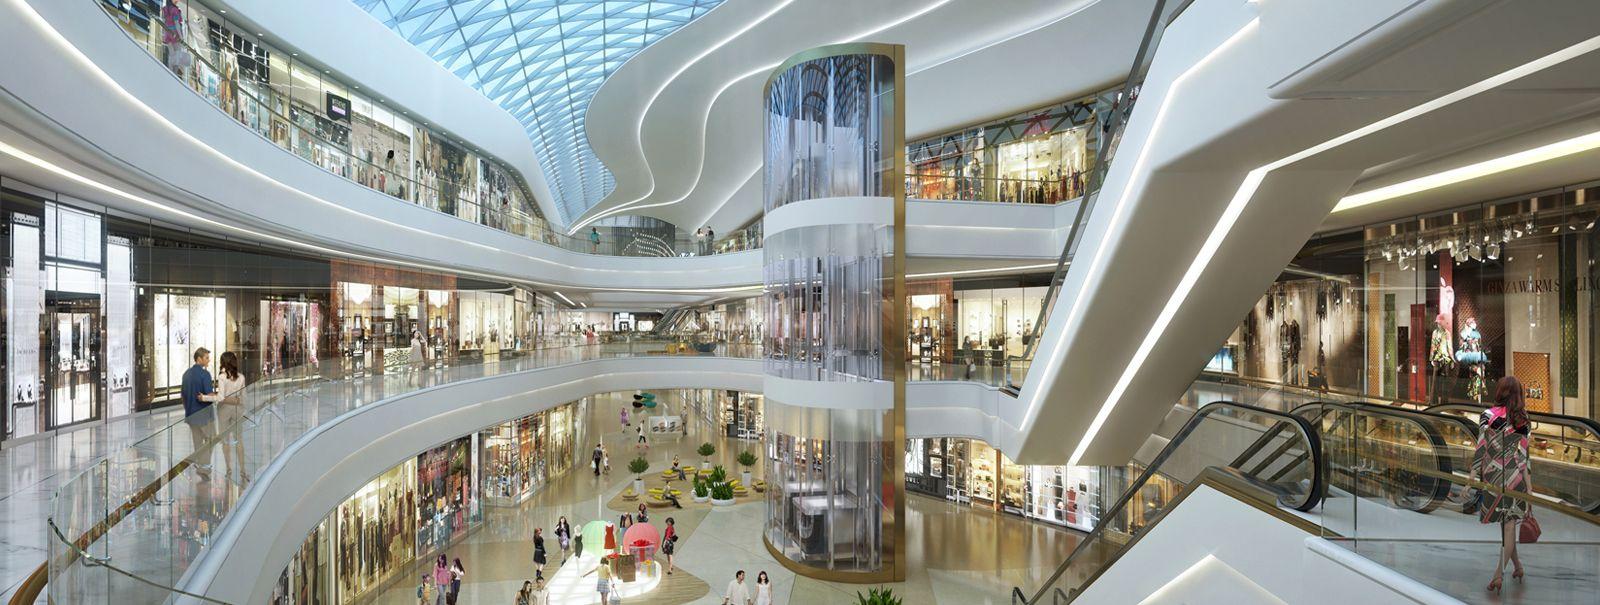 Starfield Hanam House Styles Korea Shopping Mall